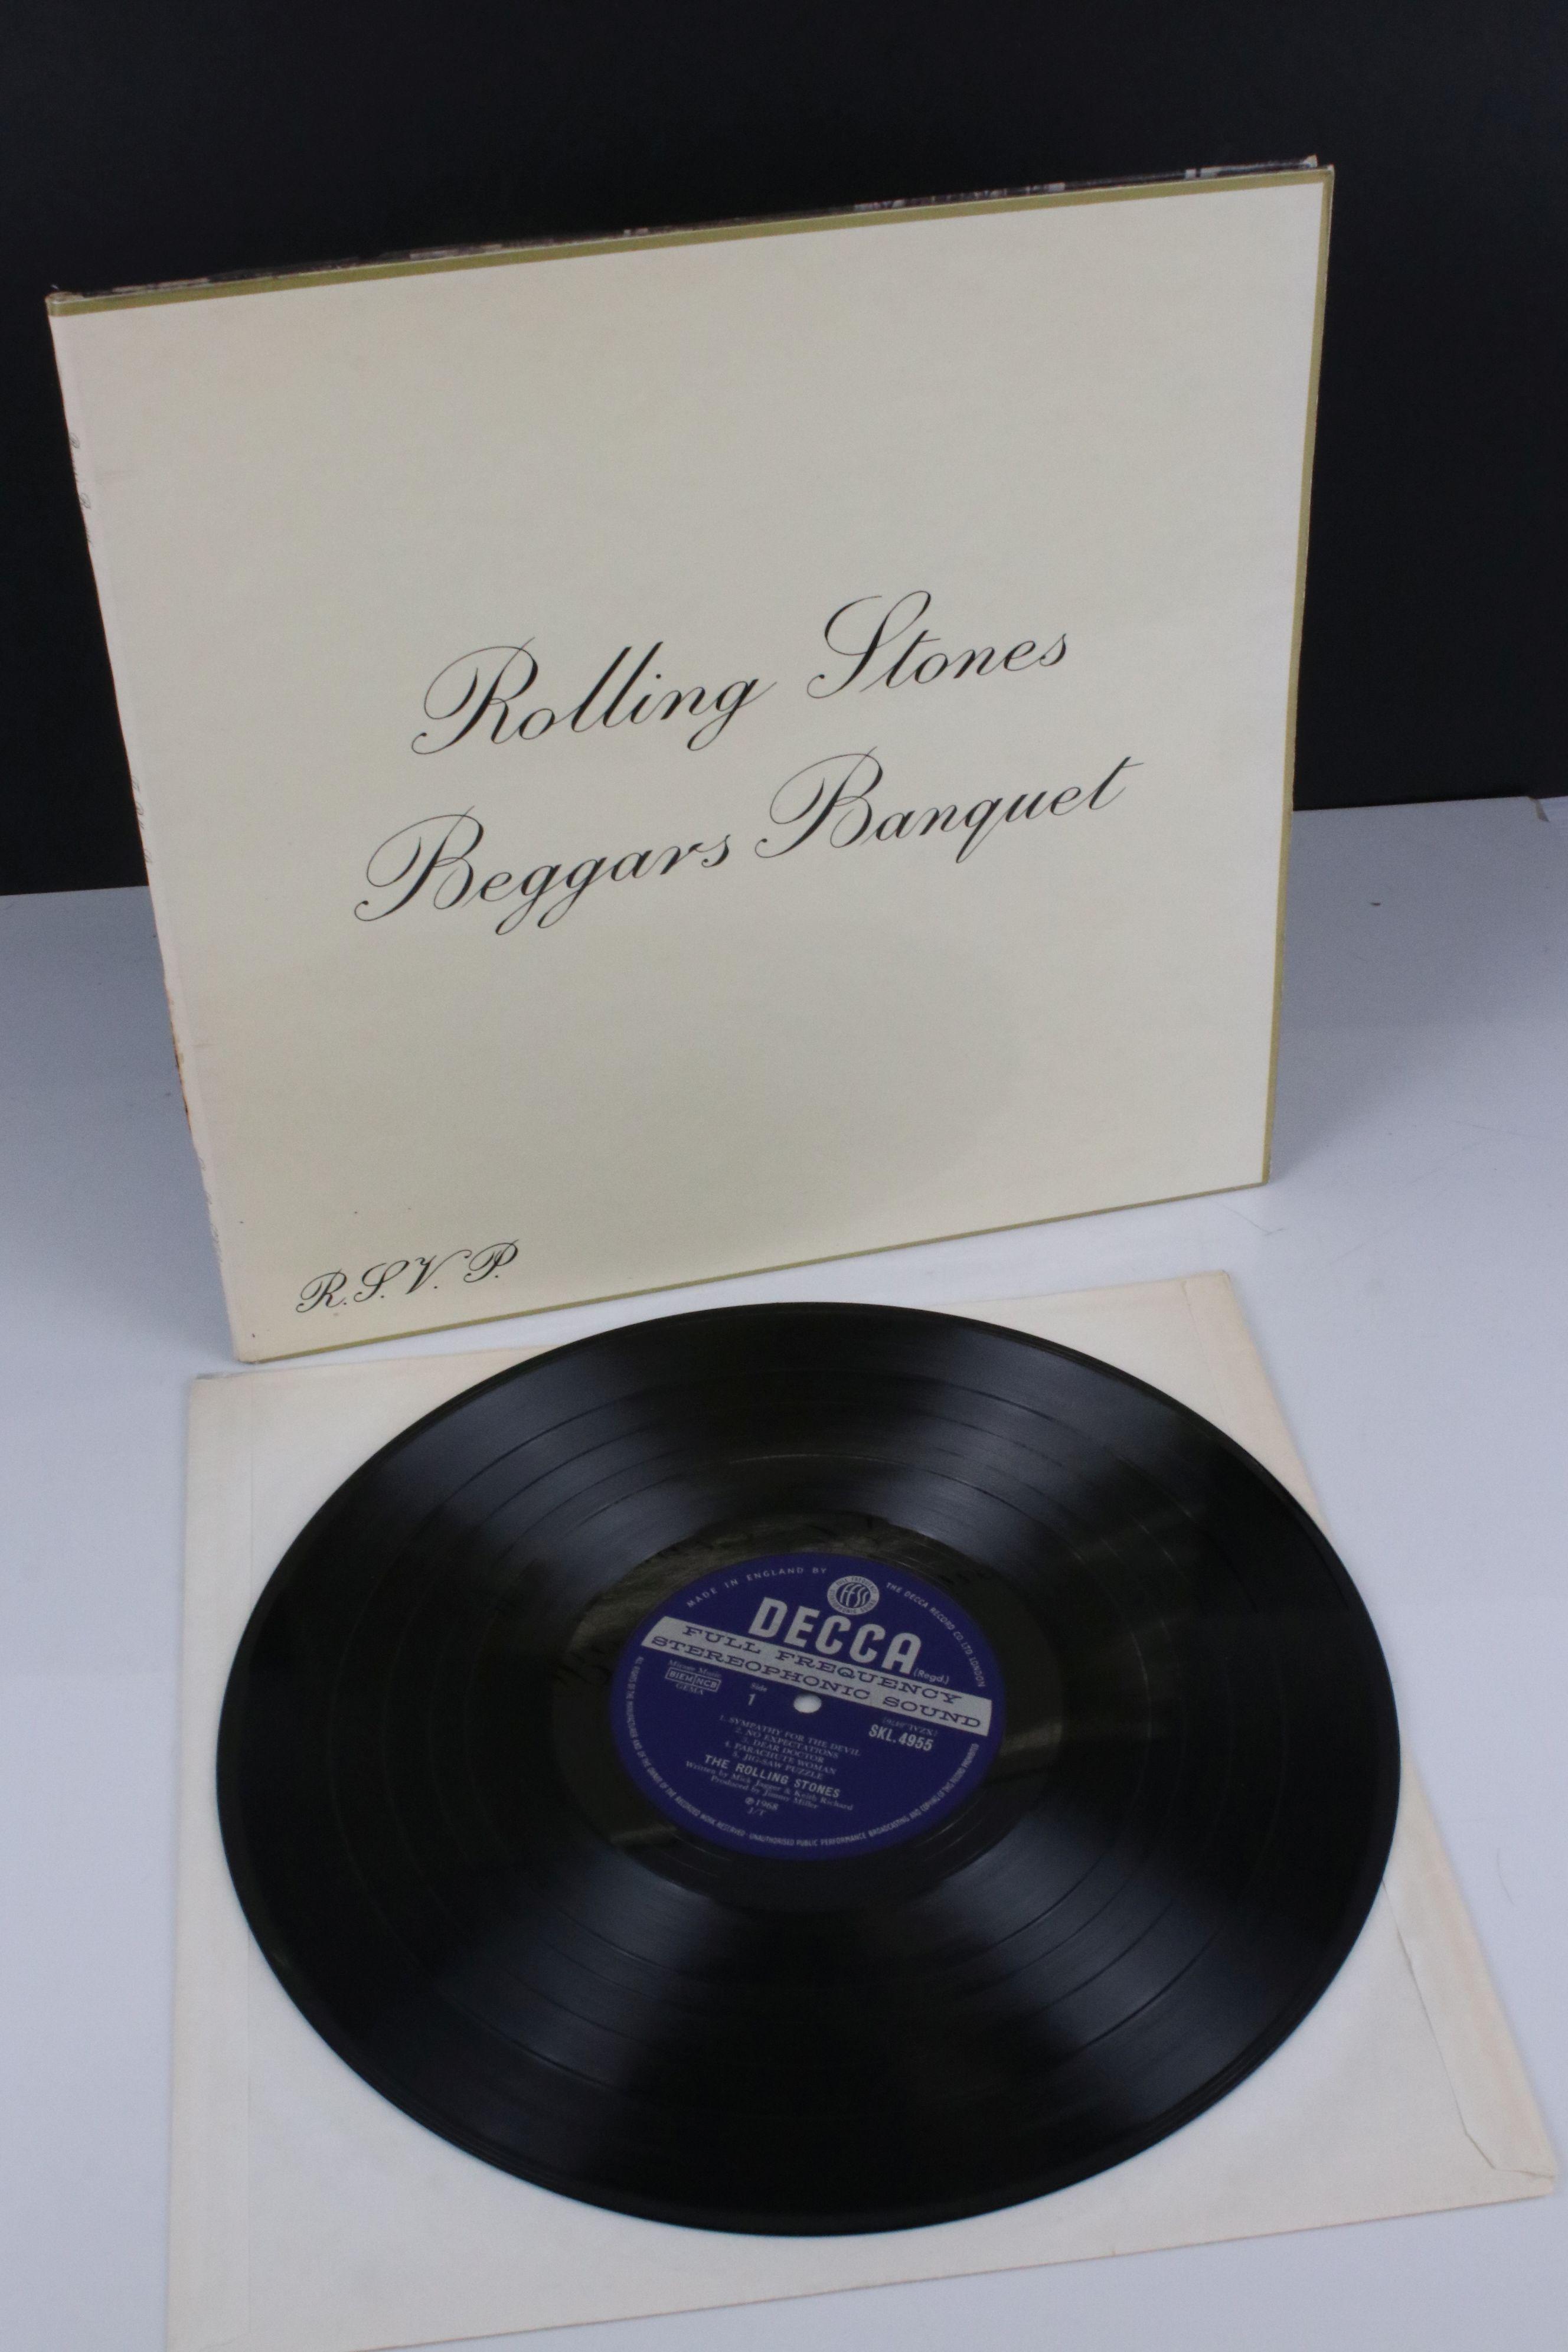 Vinyl - The Rolling Stones Beggars Banquet (SKL 4955) blue Decca label, Mirage Music, titles - Image 2 of 6